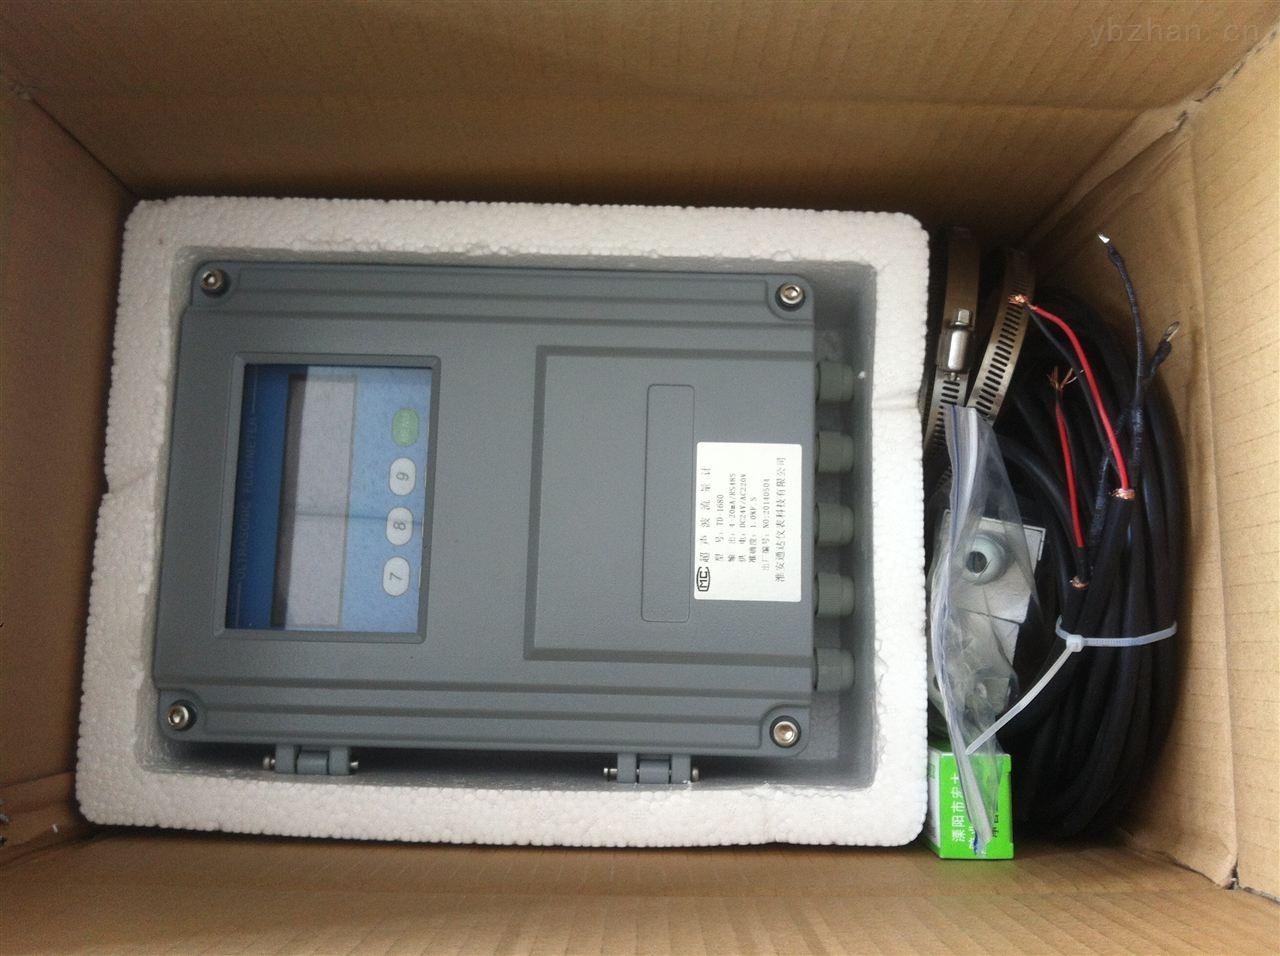 TDCSB-1500-管道式 超声波流量计